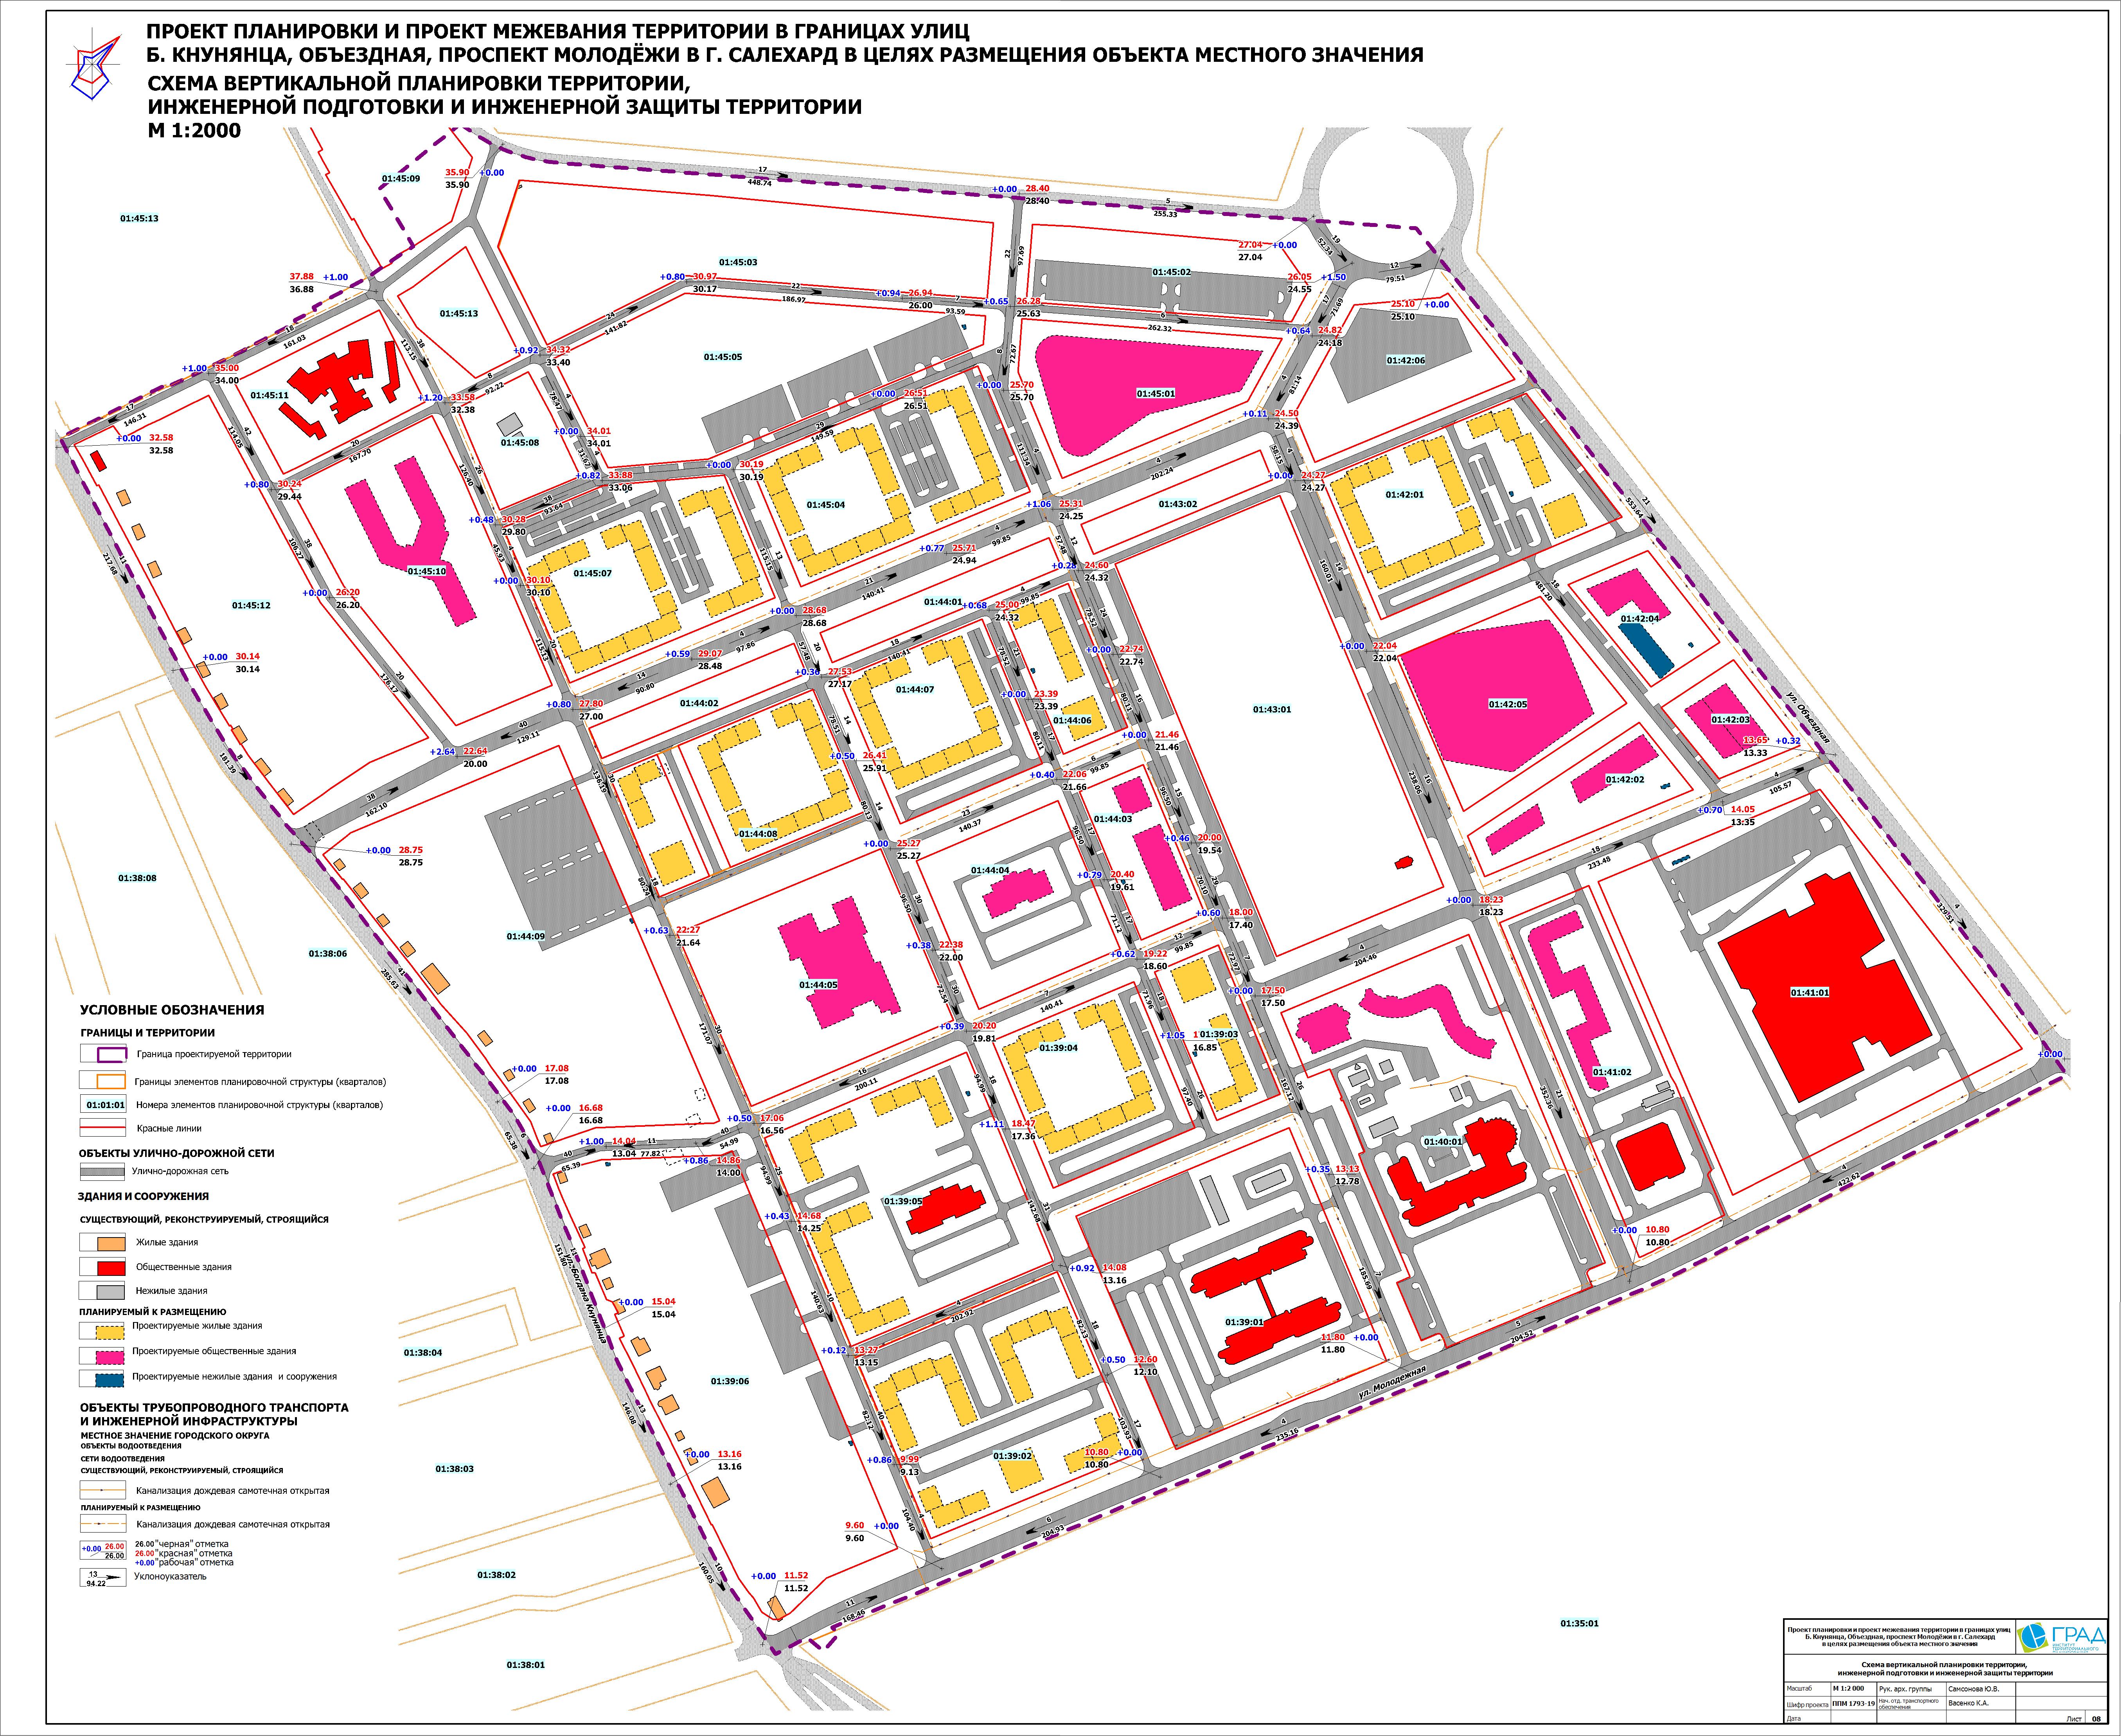 Разработка проекта планировки территории (ппт)